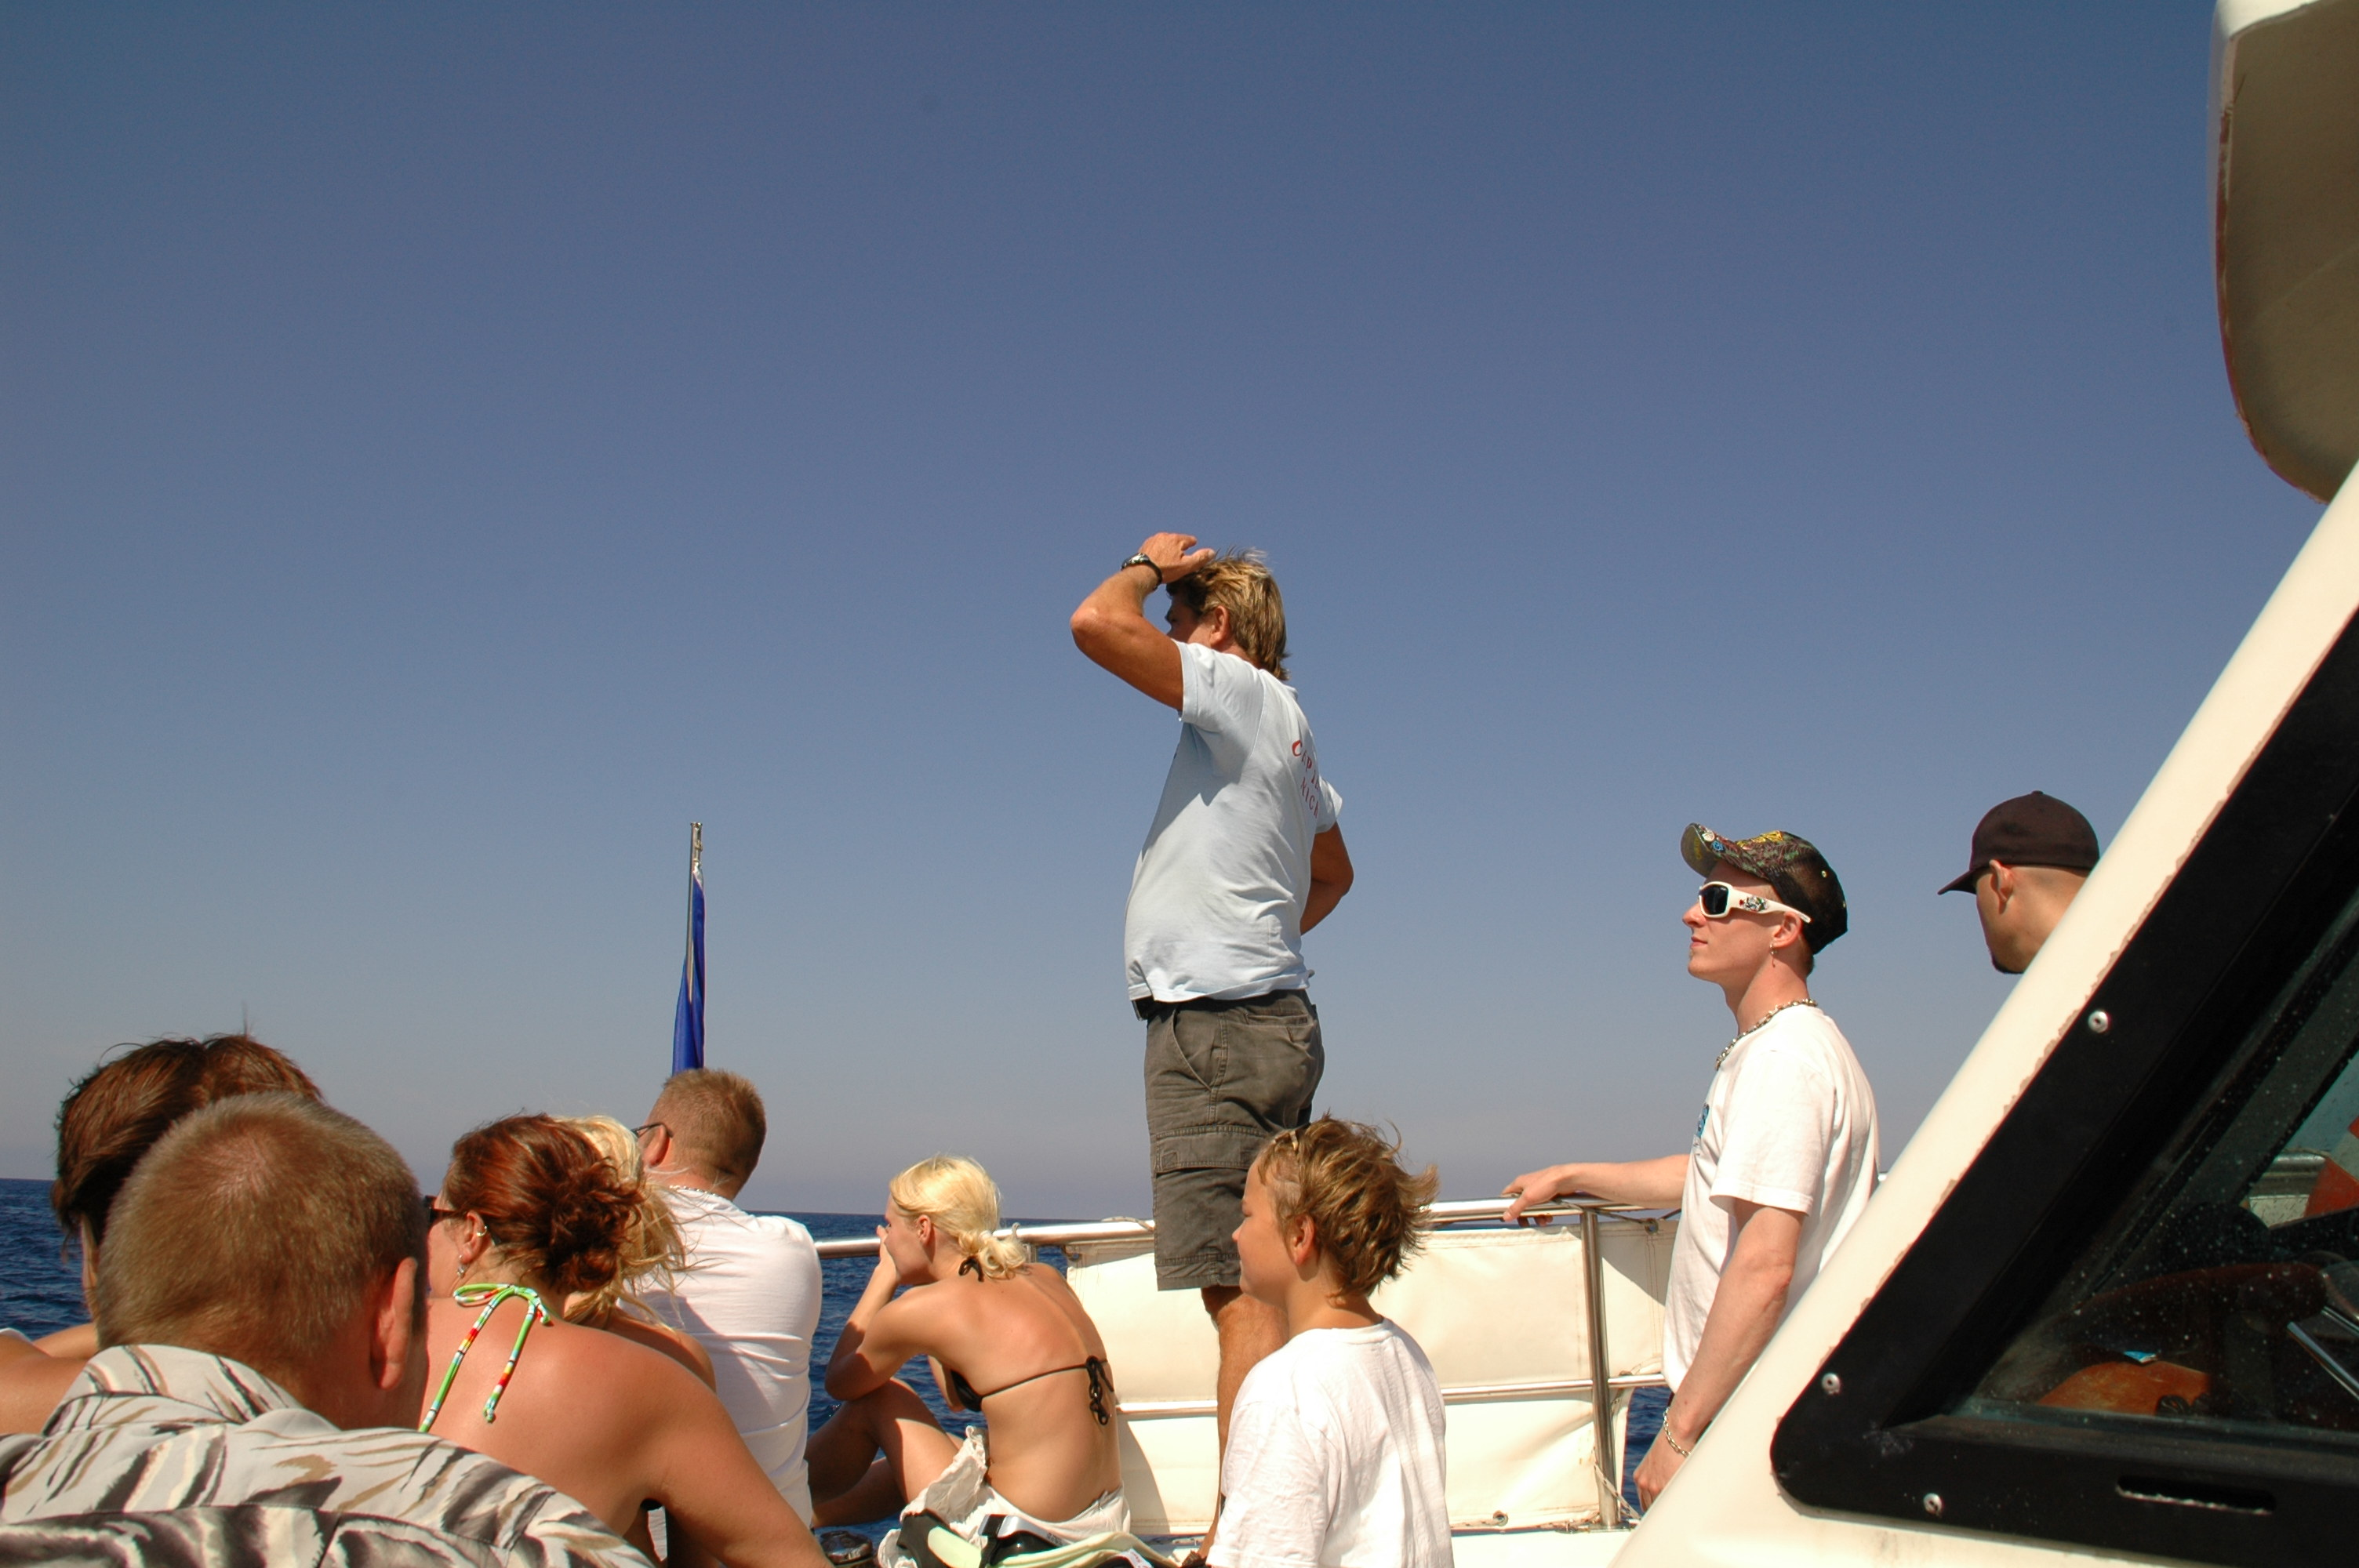 Man overlooking the ocean on boat